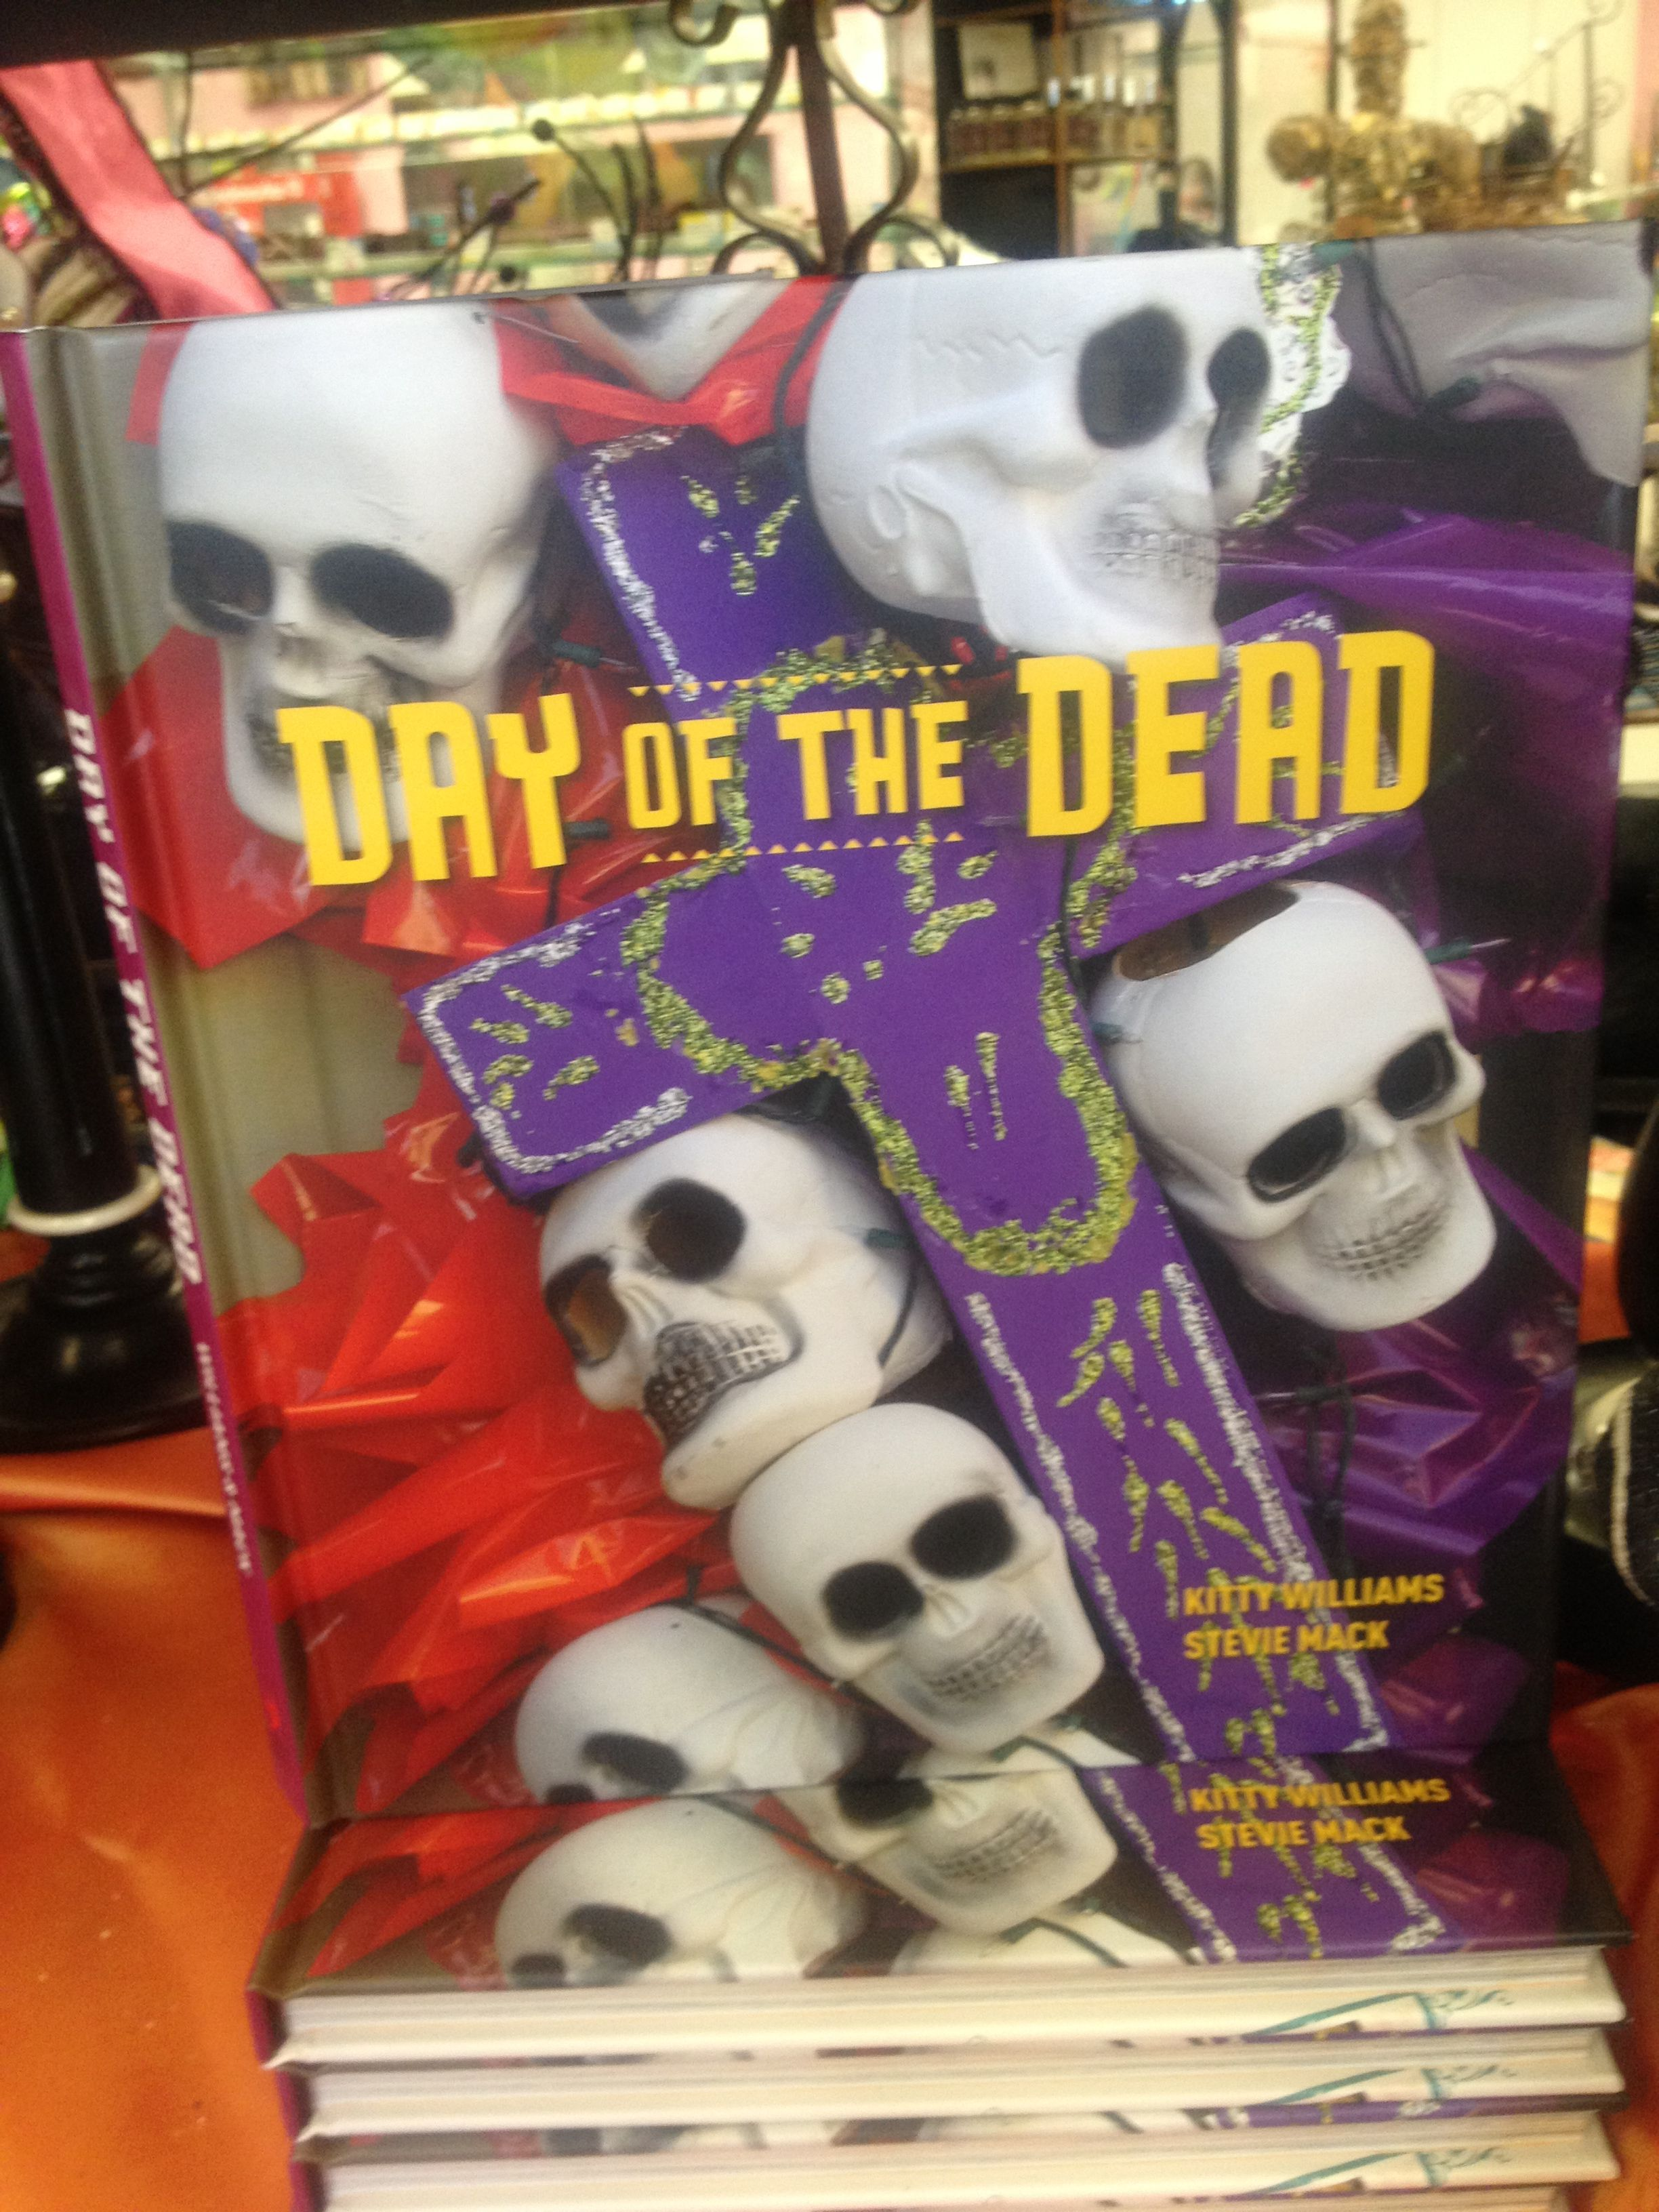 d day book with memorabilia